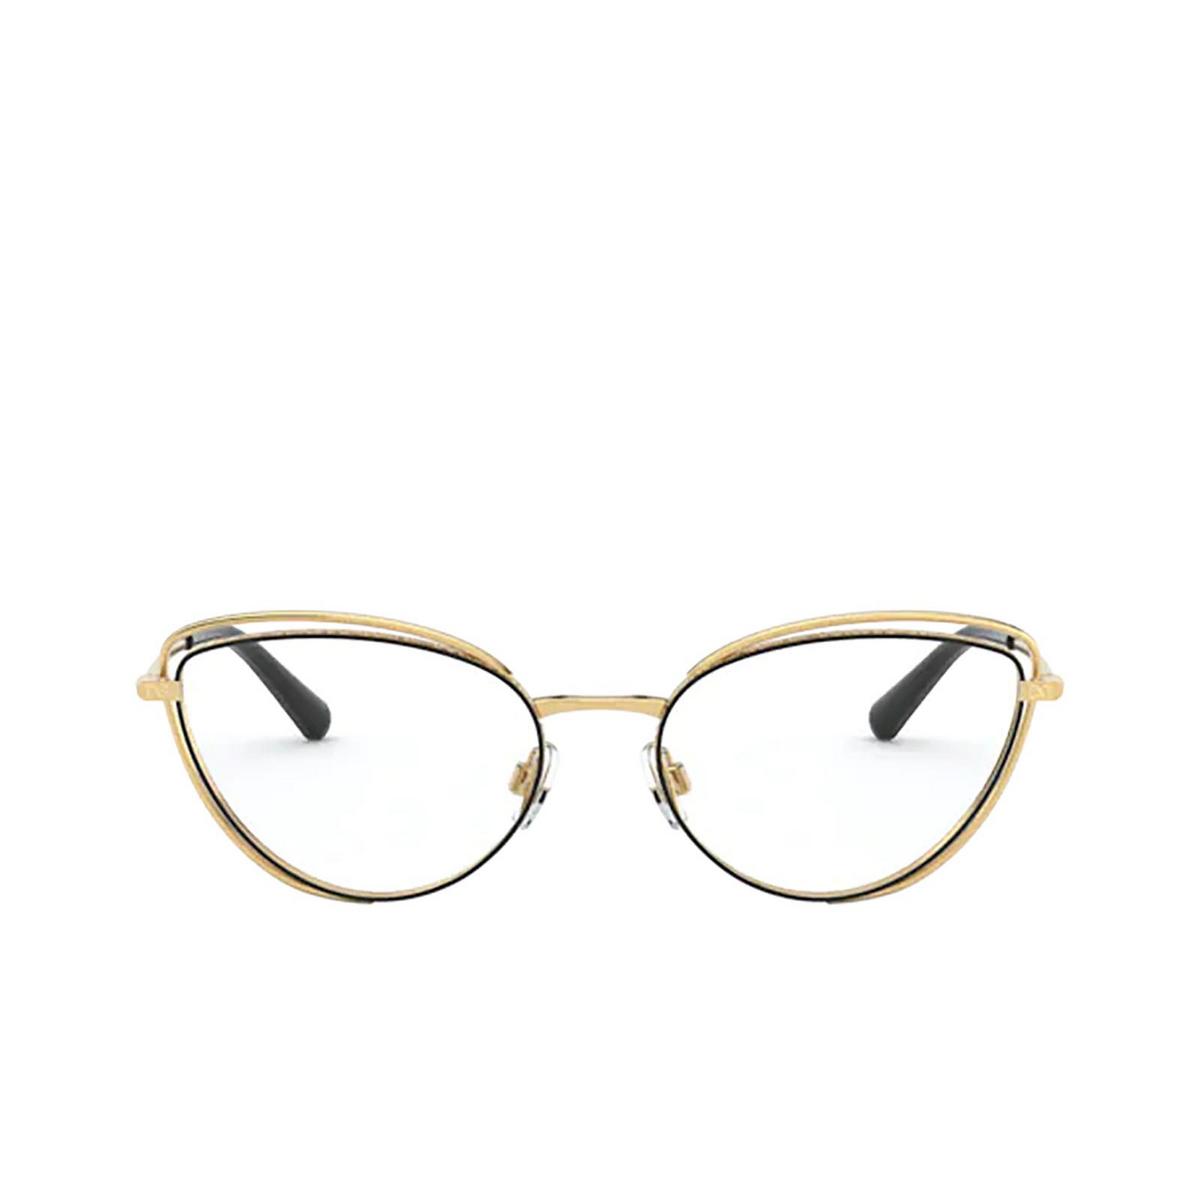 Dolce & Gabbana® Cat-eye Eyeglasses: DG1326 color Gold / Brown 1344 - front view.